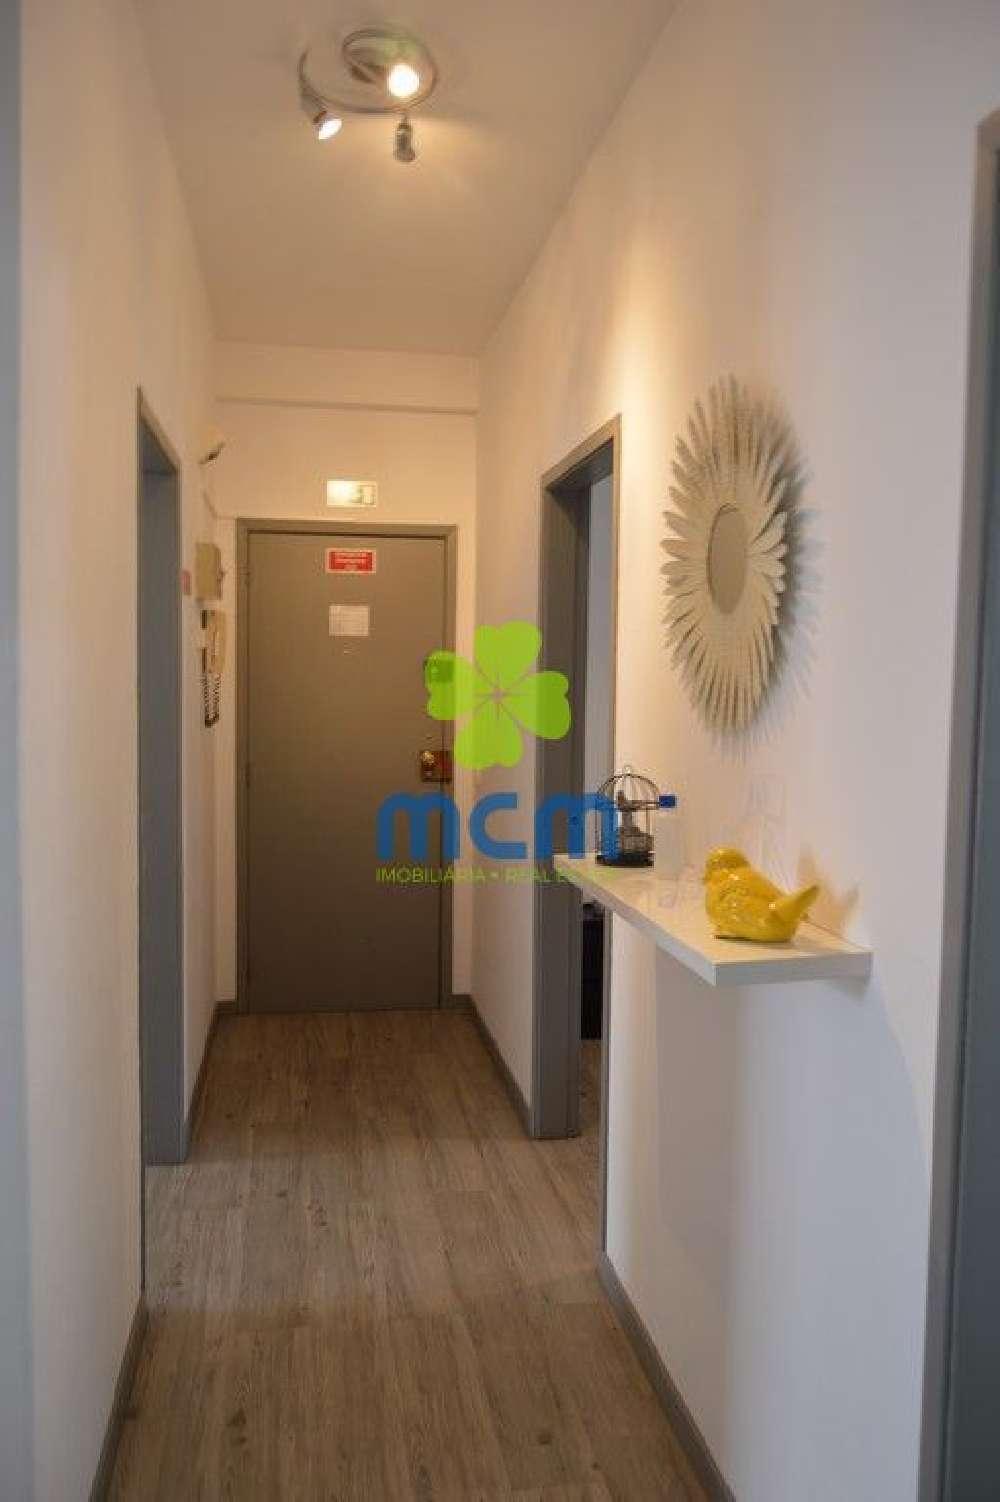 Funchal Funchal apartamento imagem 144479